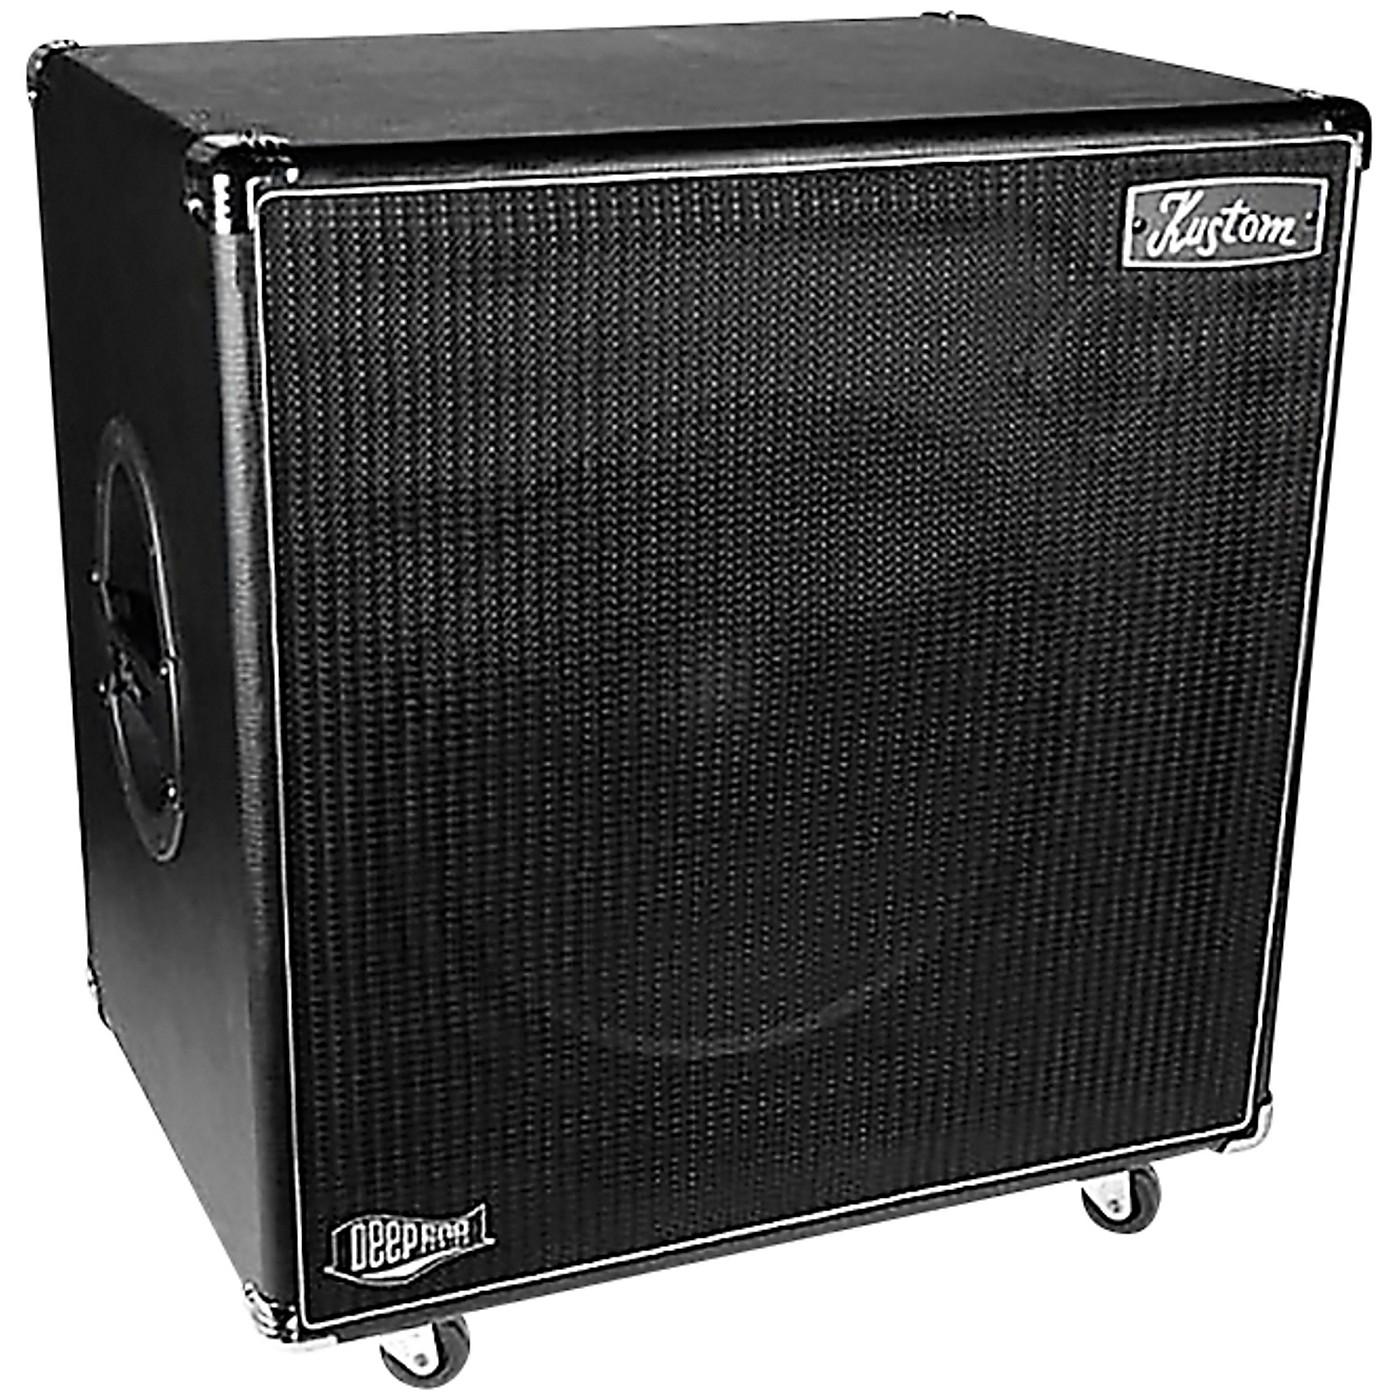 Kustom DEEP115 700W 1x15 Bass Speaker Cabinet thumbnail